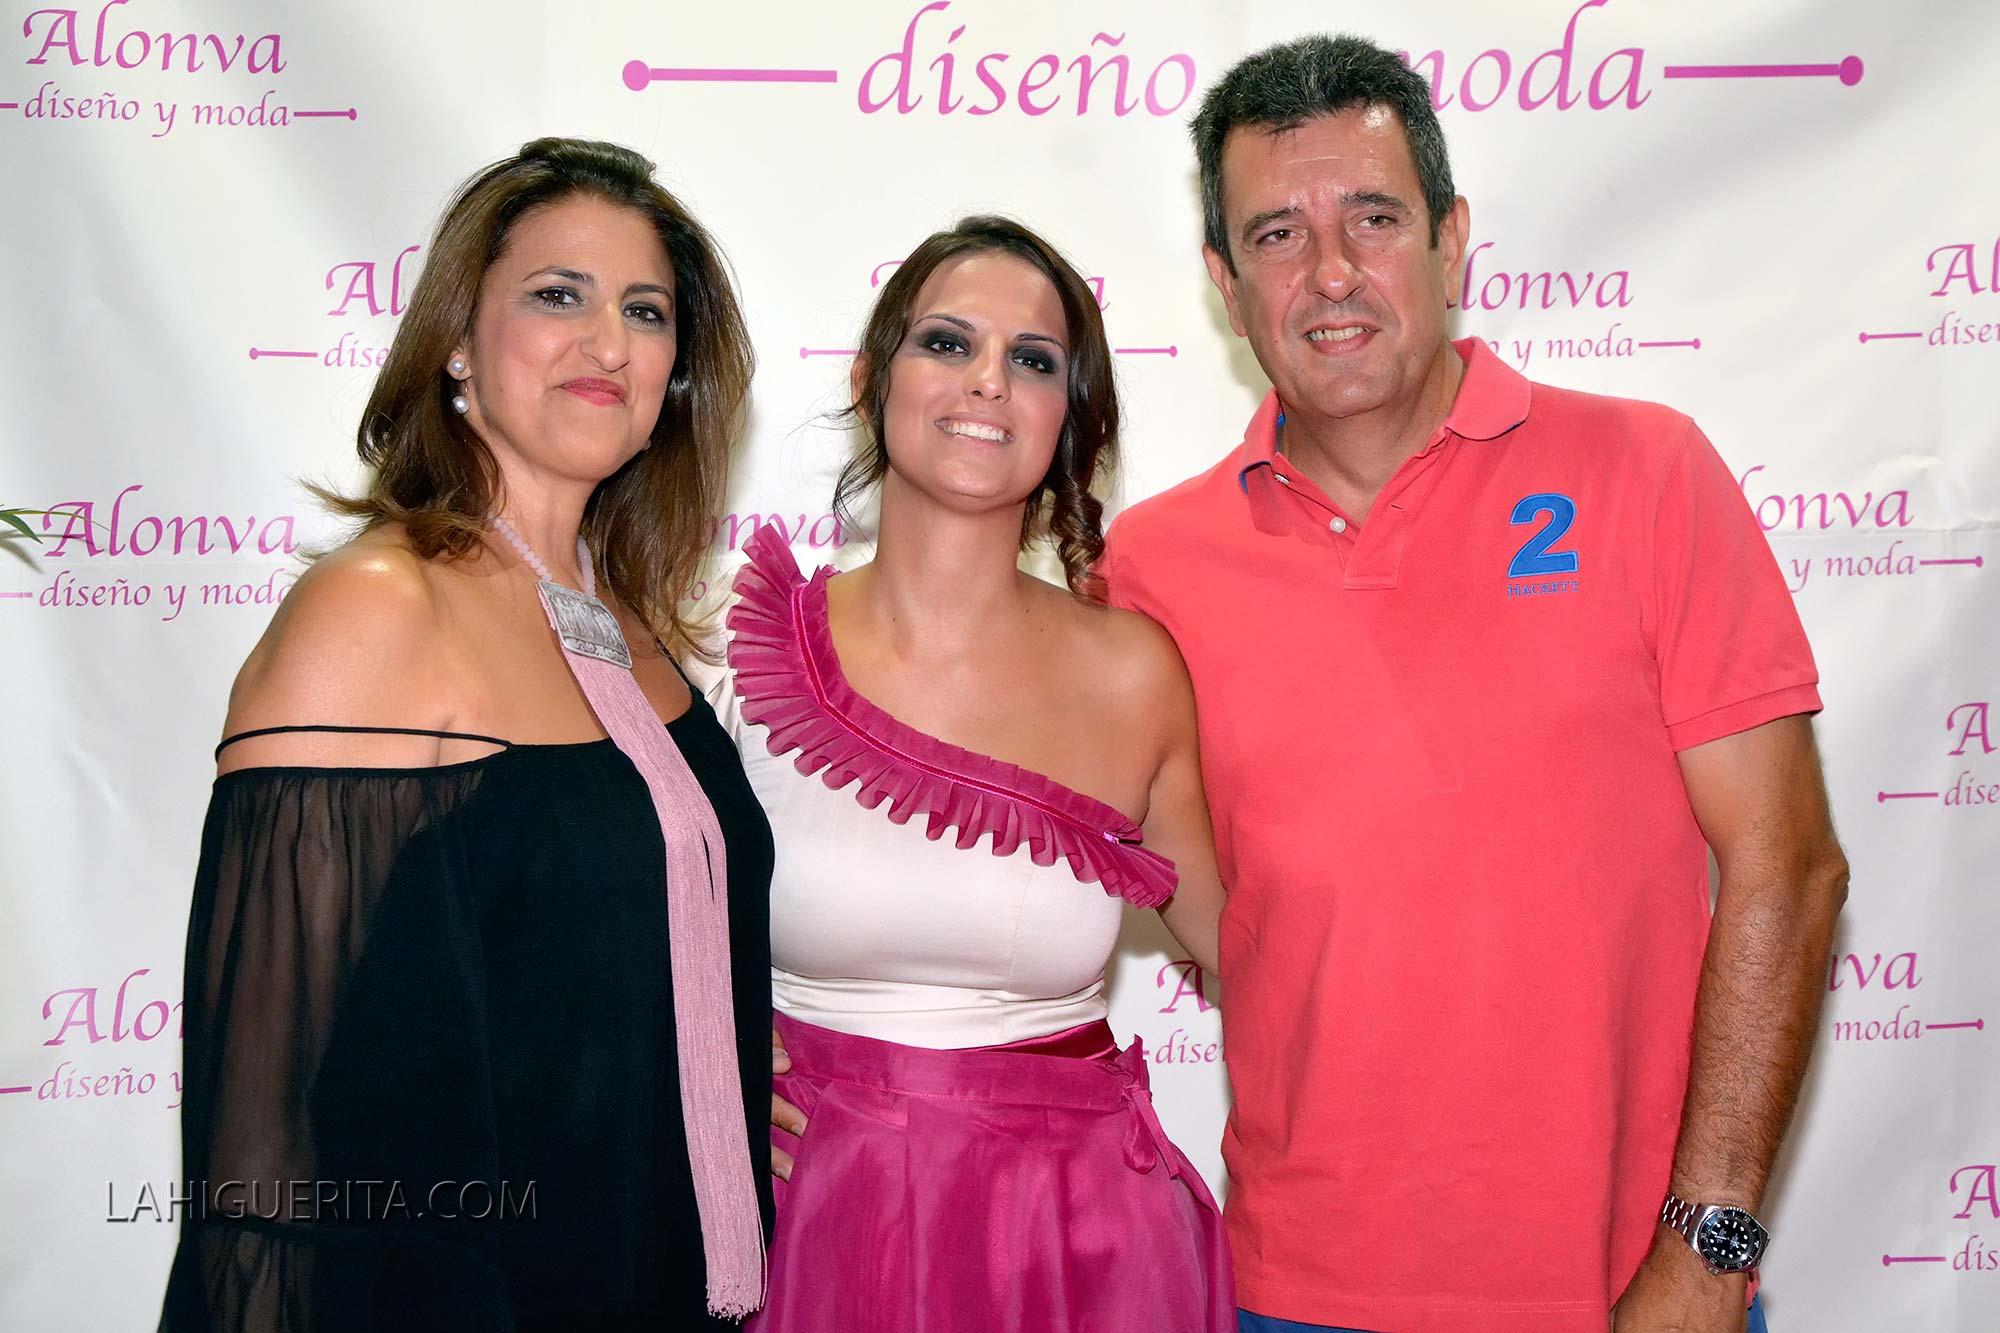 Desfile de la firma Alonva dirigida por la diseñadora de moda isleña, Cristina Vargas Alonso